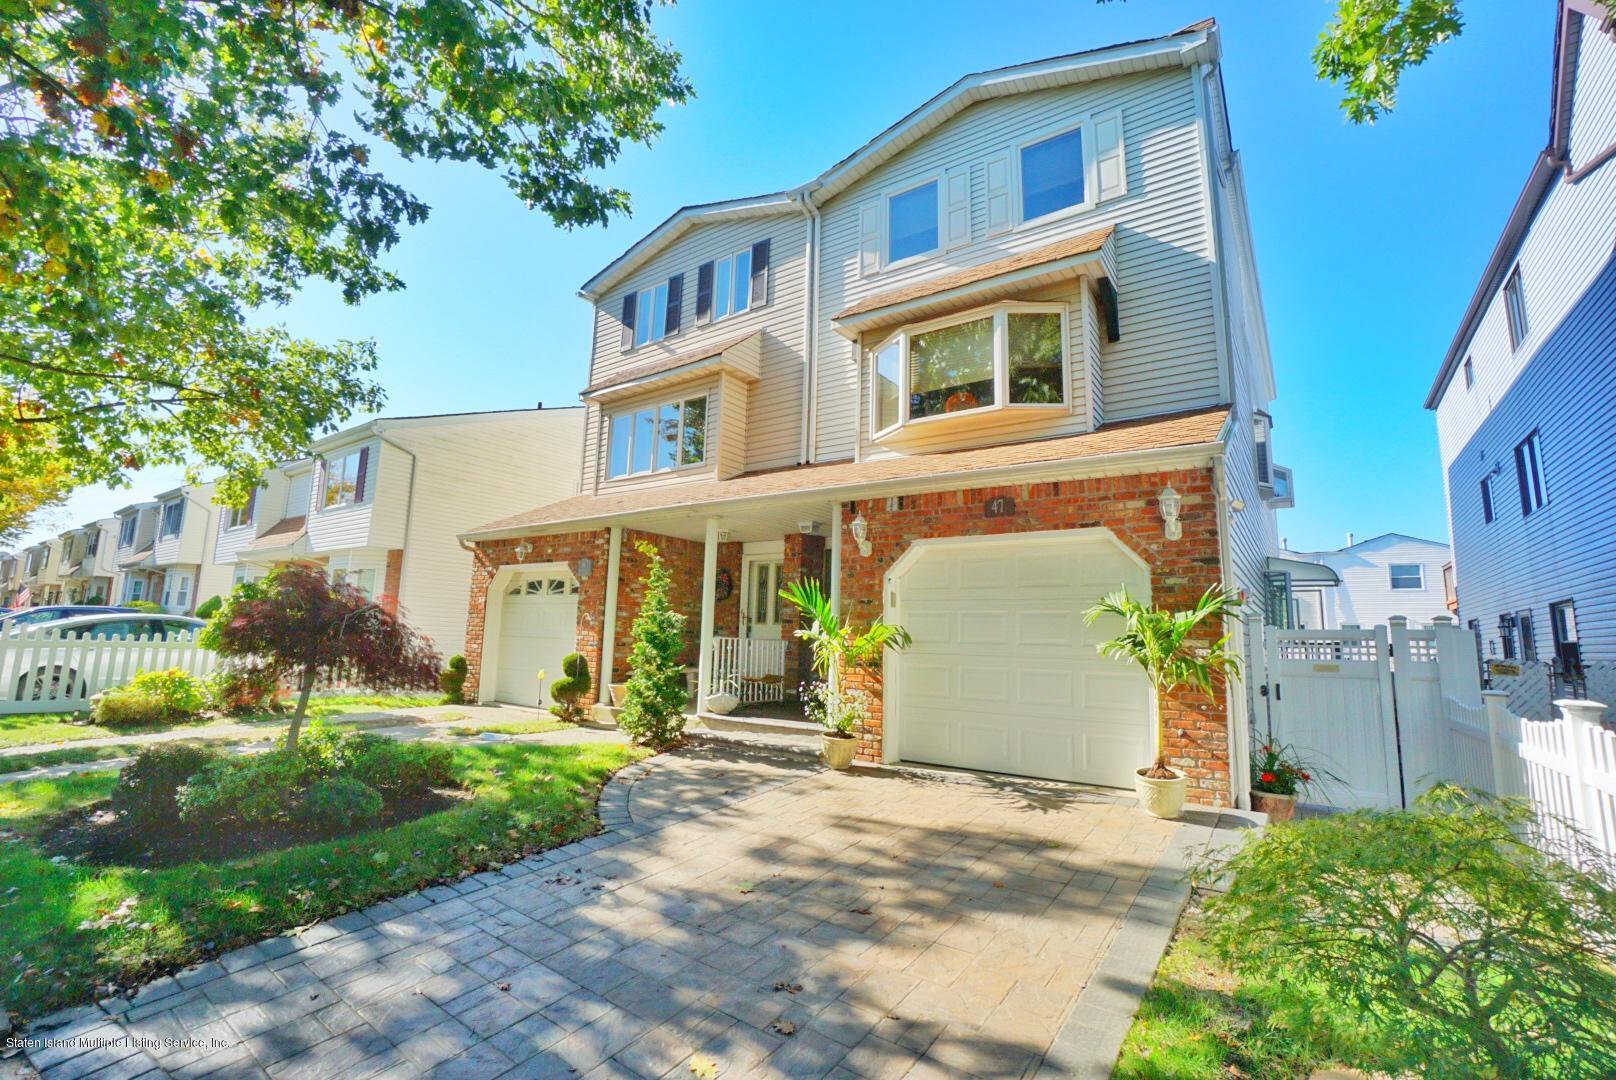 Single Family - Semi-Attached 47 Ilyse Court   Staten Island, NY 10306, MLS-1141335-2